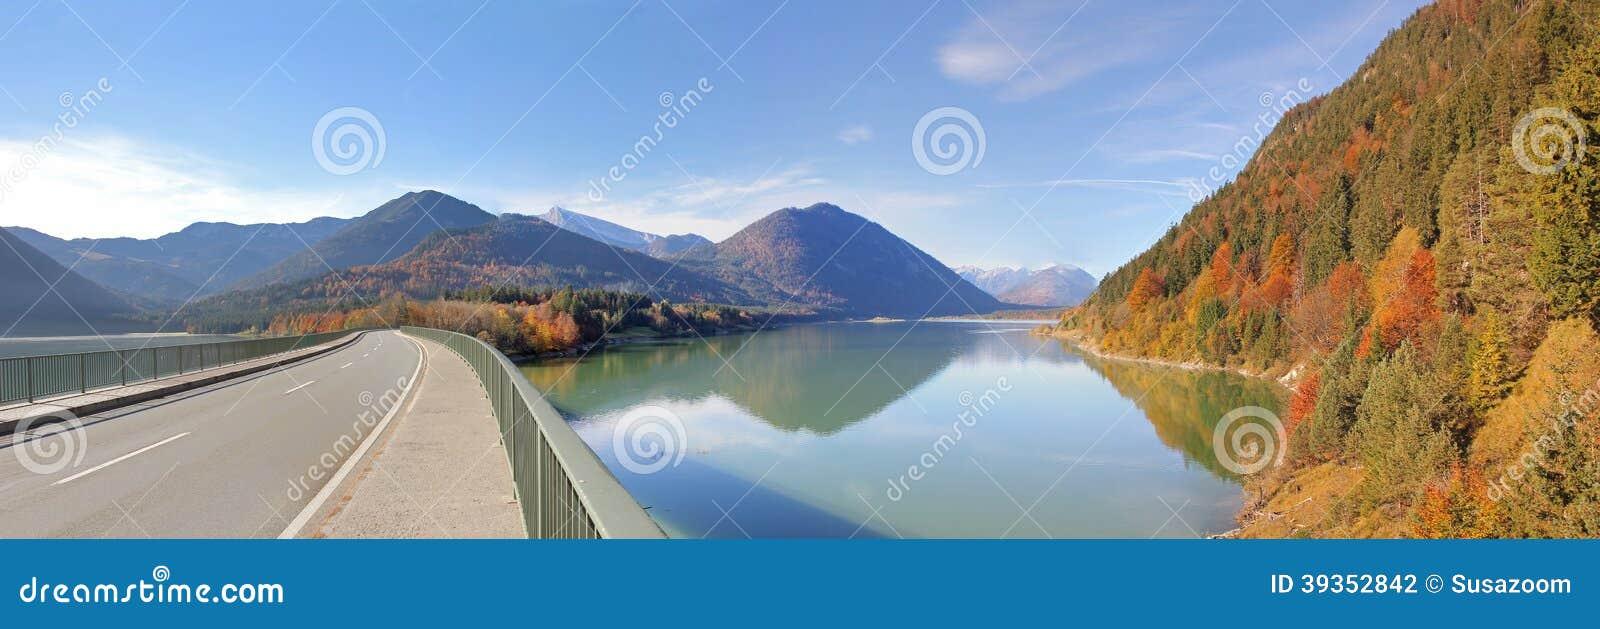 Sylvenstein e ponte do lago panoramic view, alemães